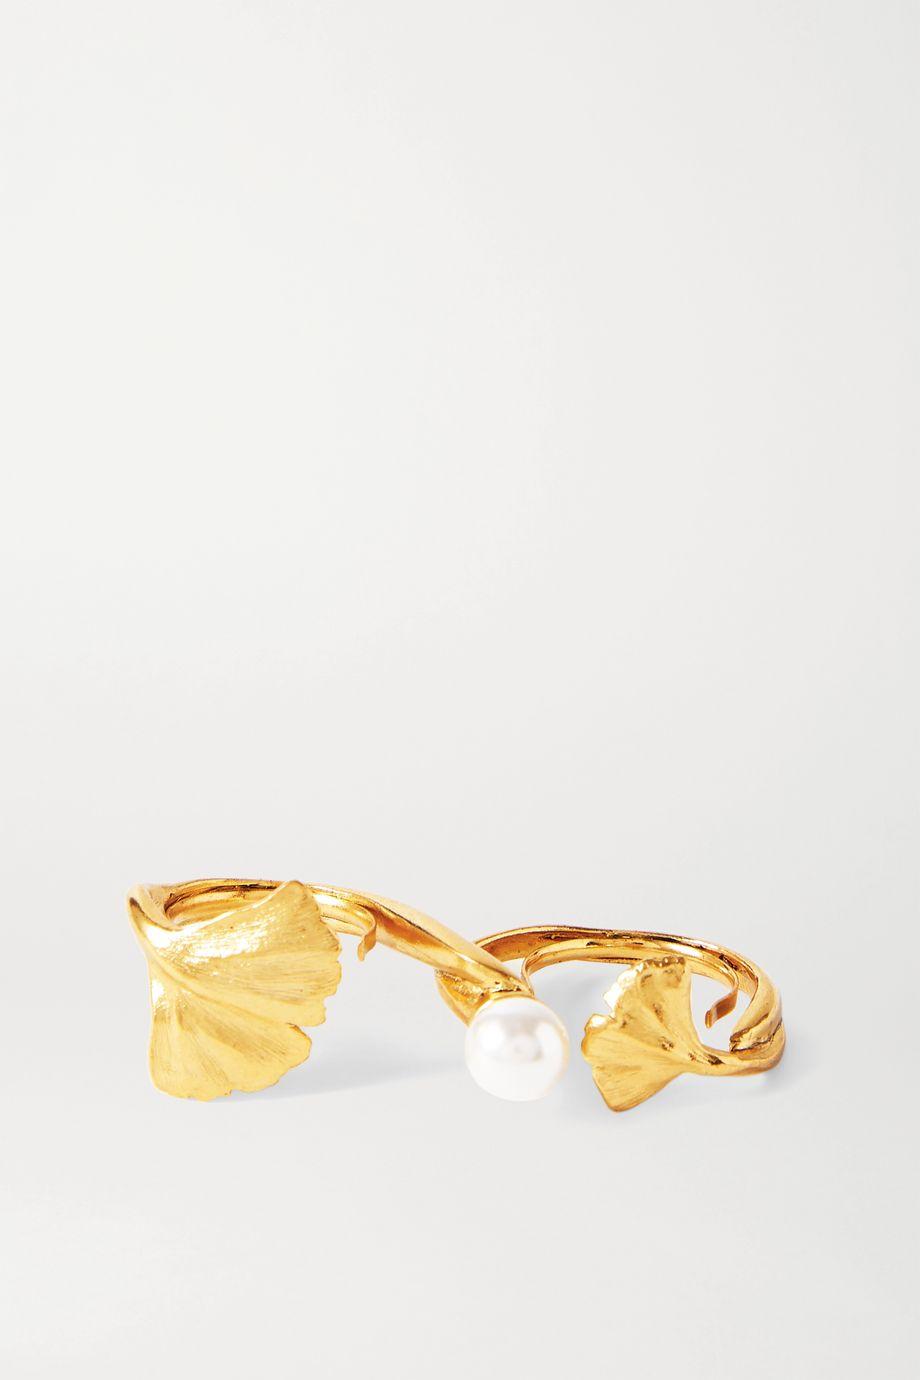 Oscar de la Renta Gold-tone faux pearl two-finger ring